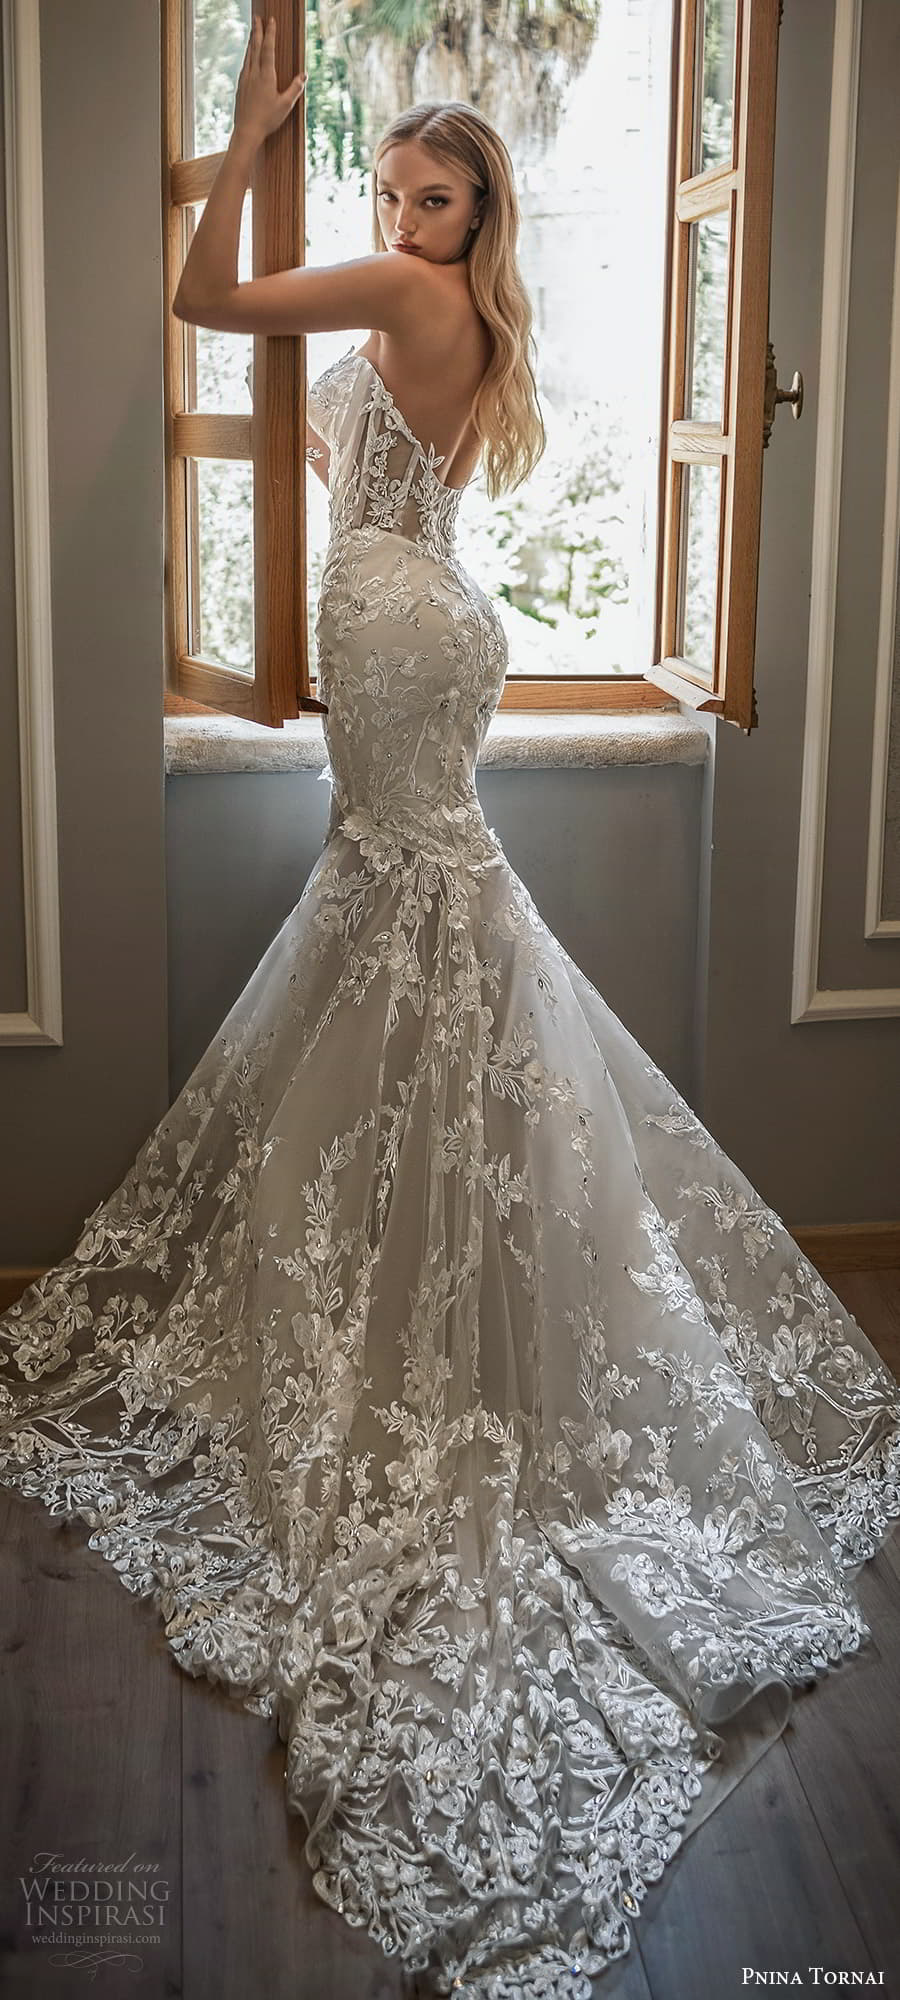 pnina tornai 2022 love bridal strapless sweetheart neckline fully embellished lace fit flare mermaid wedding dress chapel train (15) bv